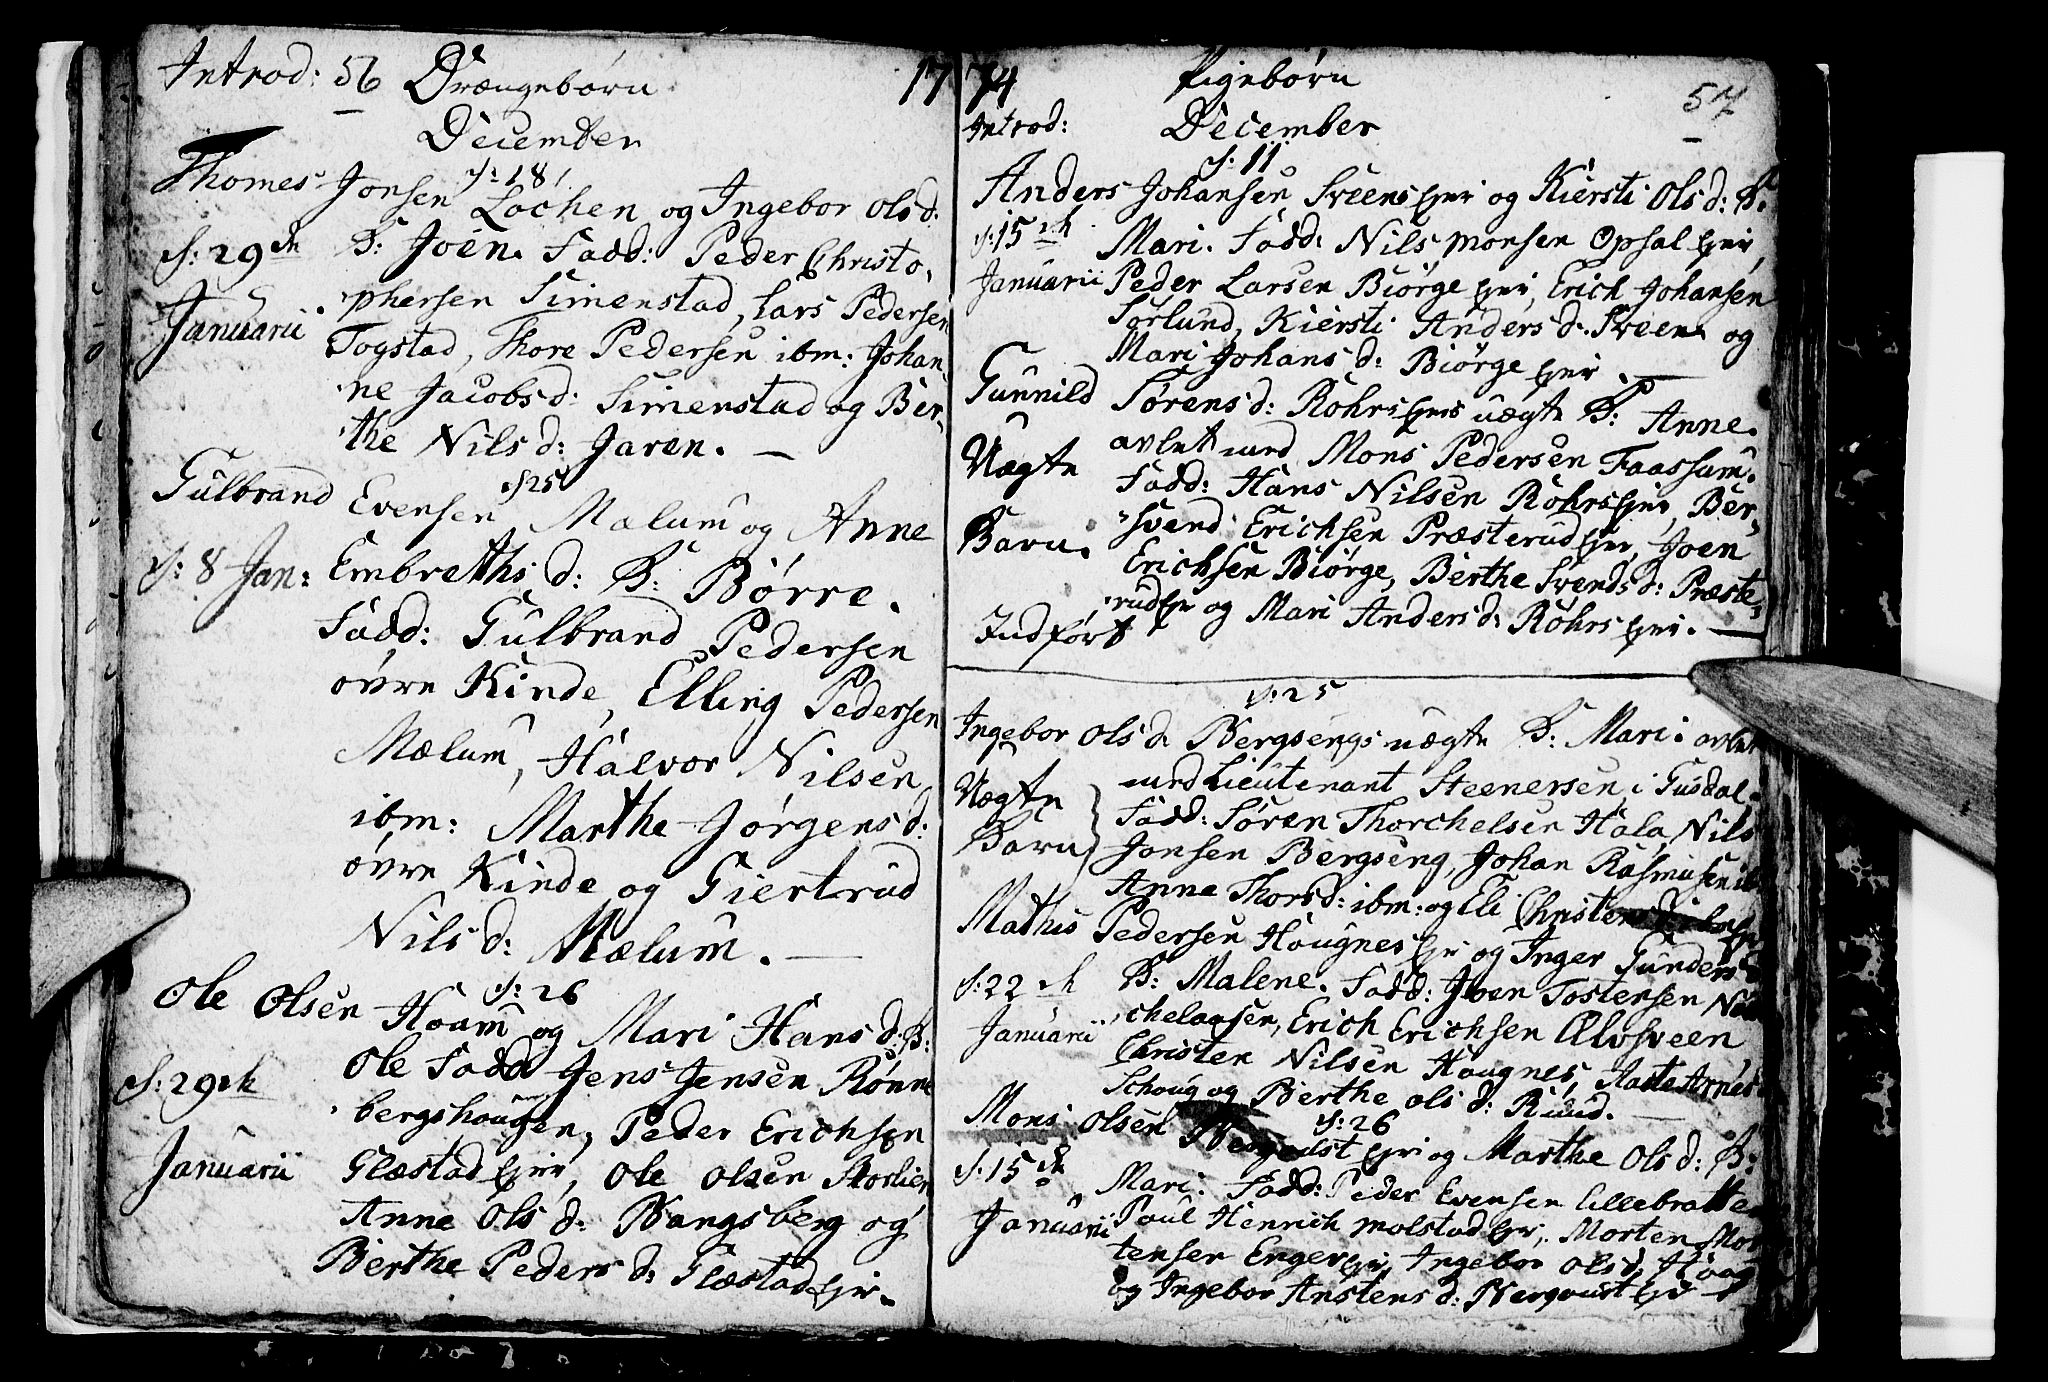 SAH, Ringsaker prestekontor, I/Ia/L0005/0001: Kladd til kirkebok nr. 1A, 1773-1775, s. 56-57